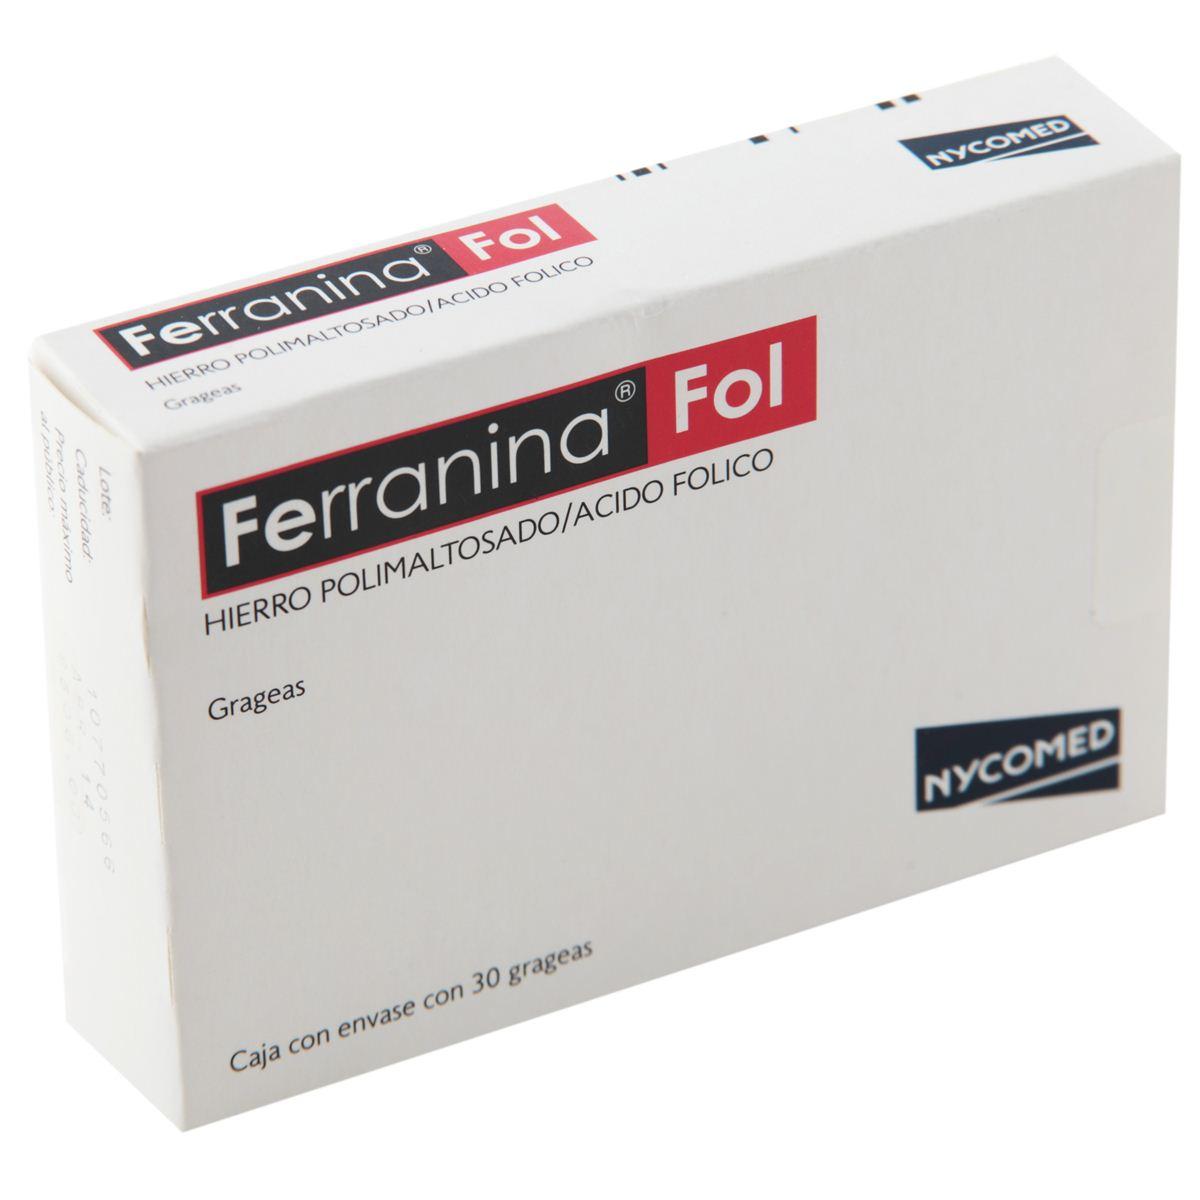 Ferranina Fol Grag 30